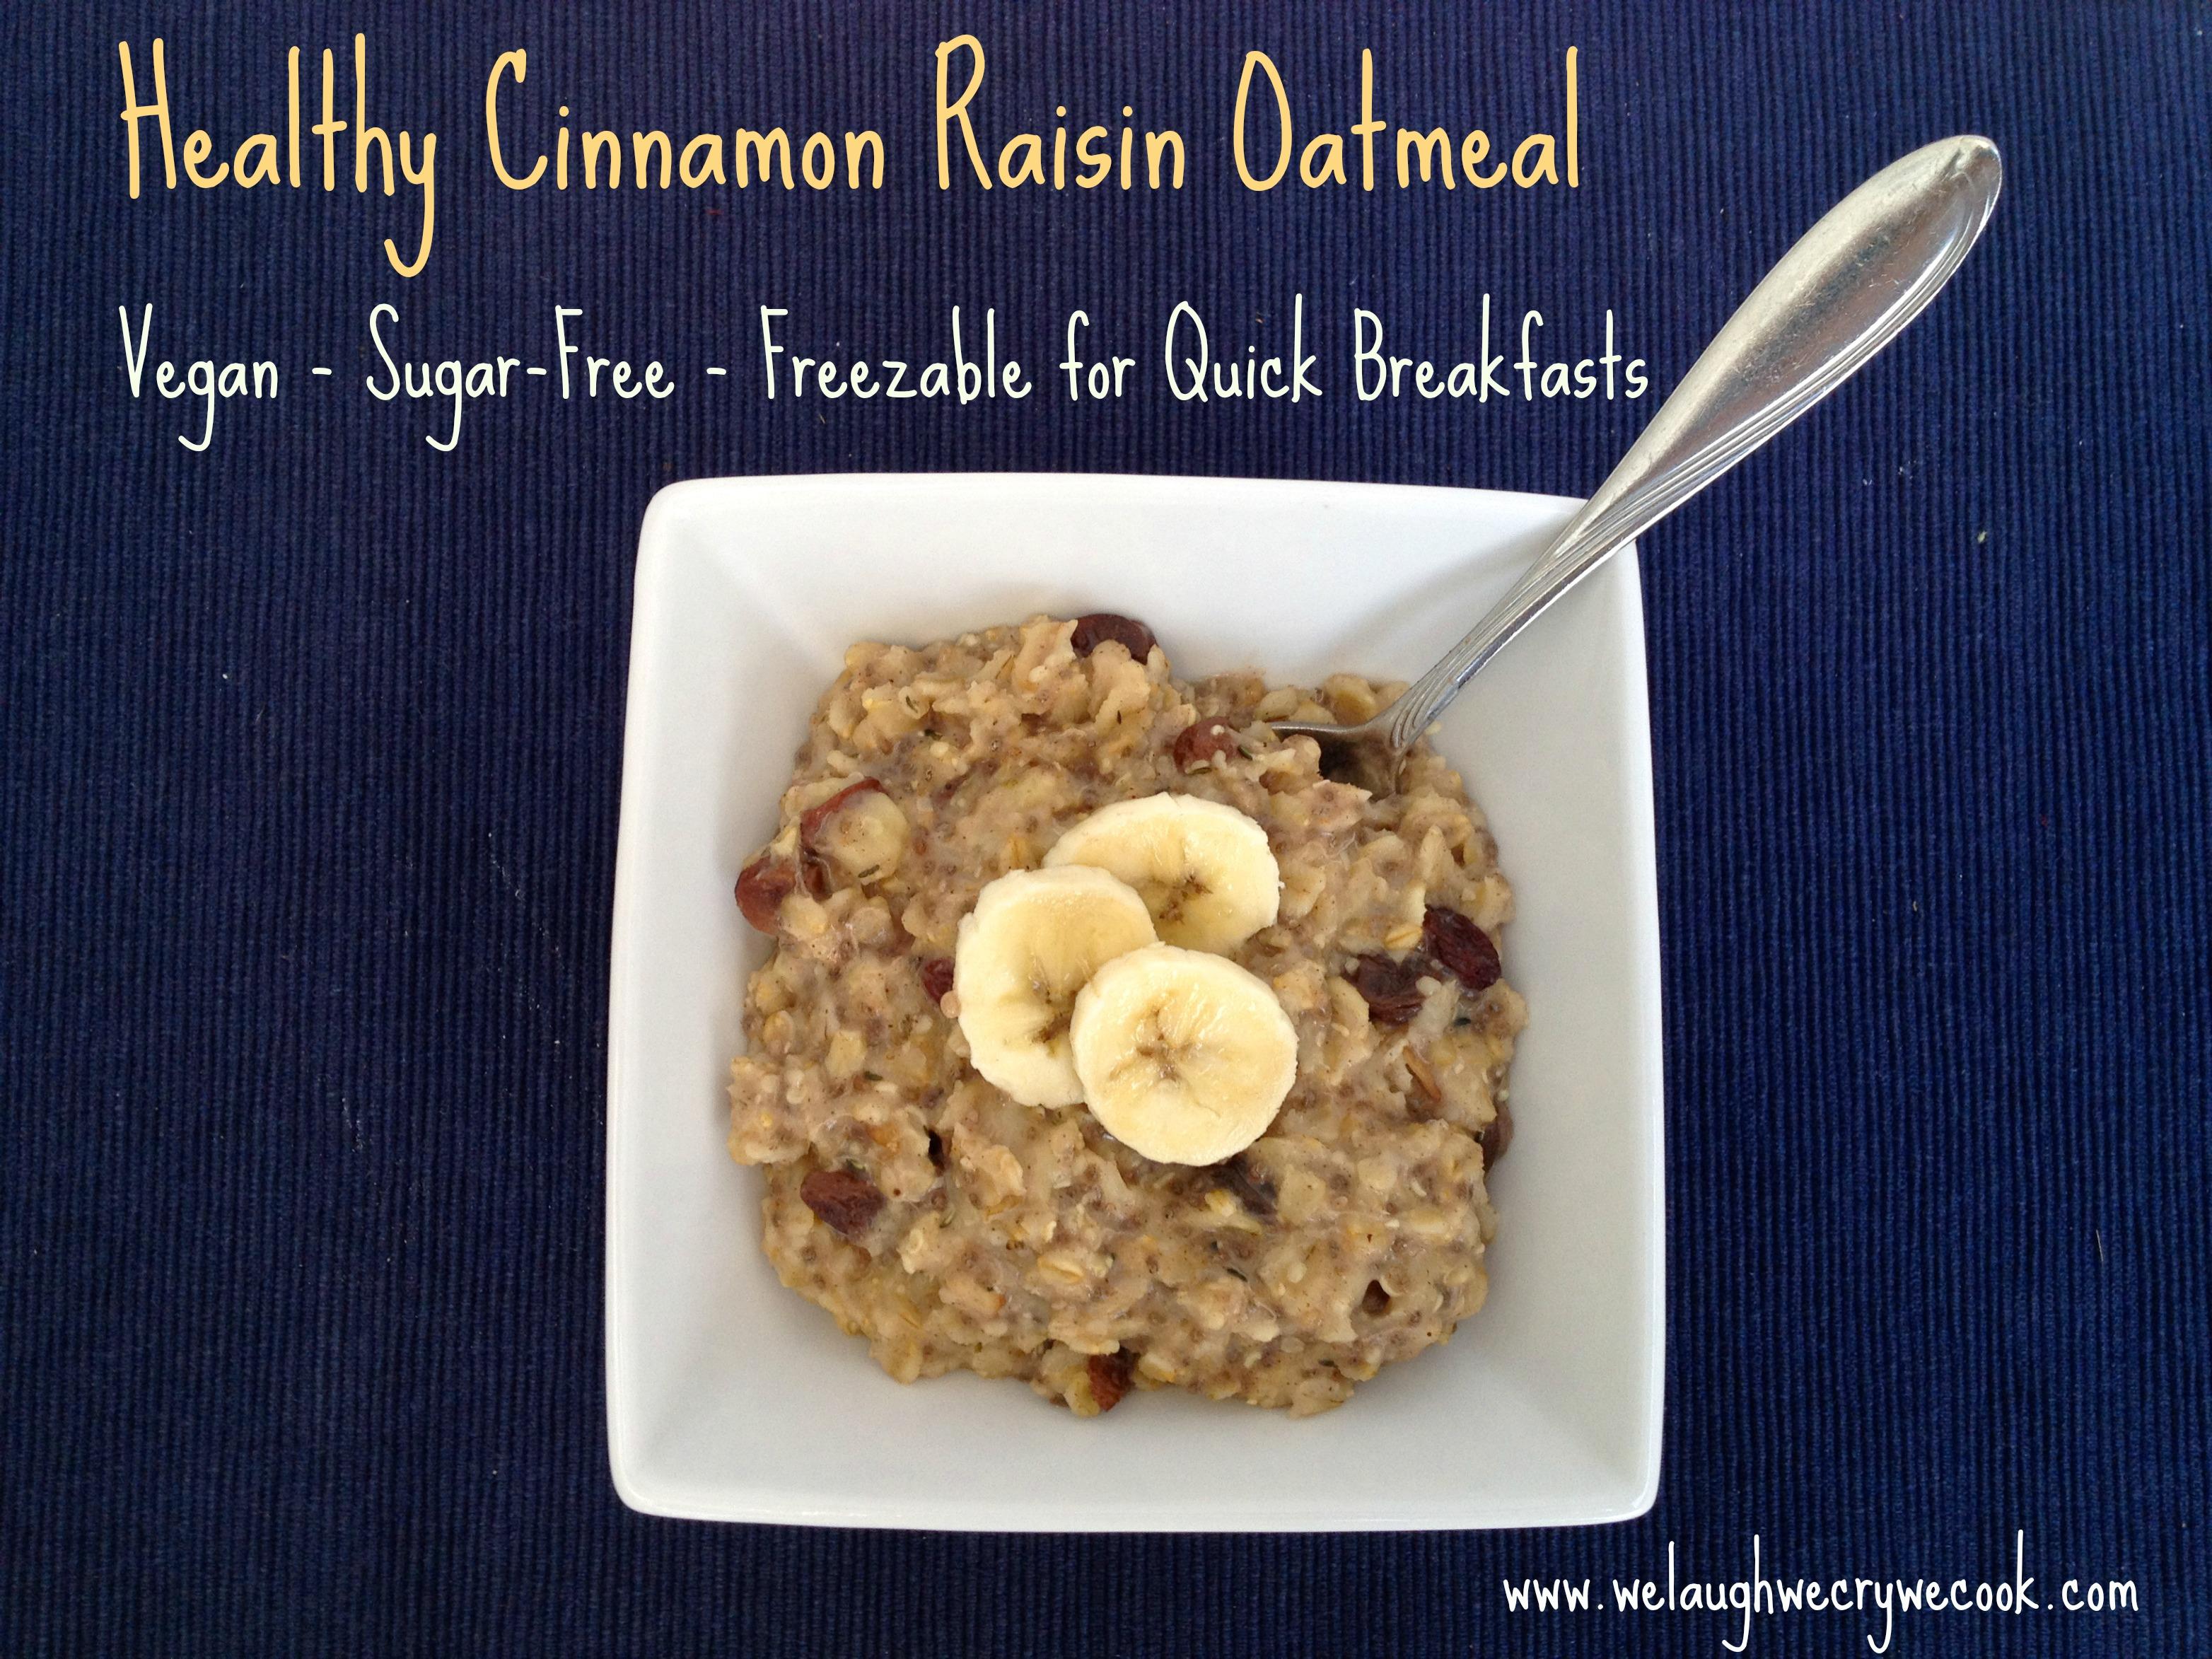 Healthy Cinnamon Raisin Oatmeal (Vegan, Sugar-Free